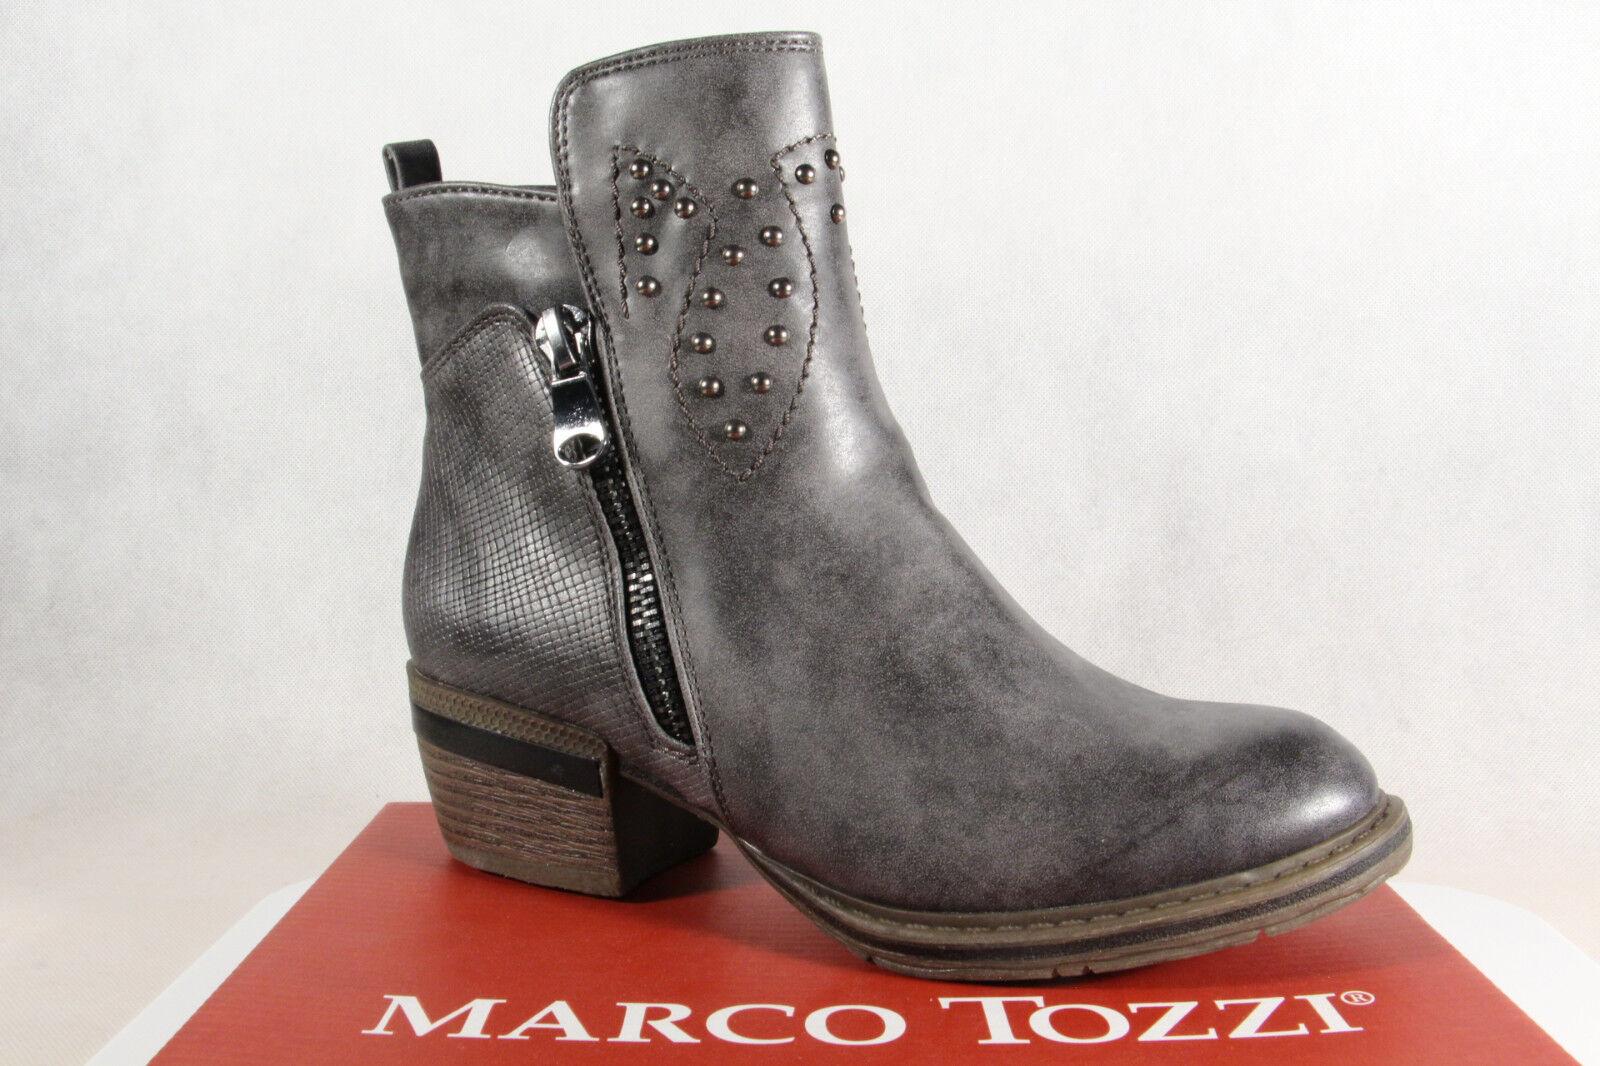 Marco Tozzi Stiefel, Stiefelette, grau, leicht gefüttert, 25361 NEU